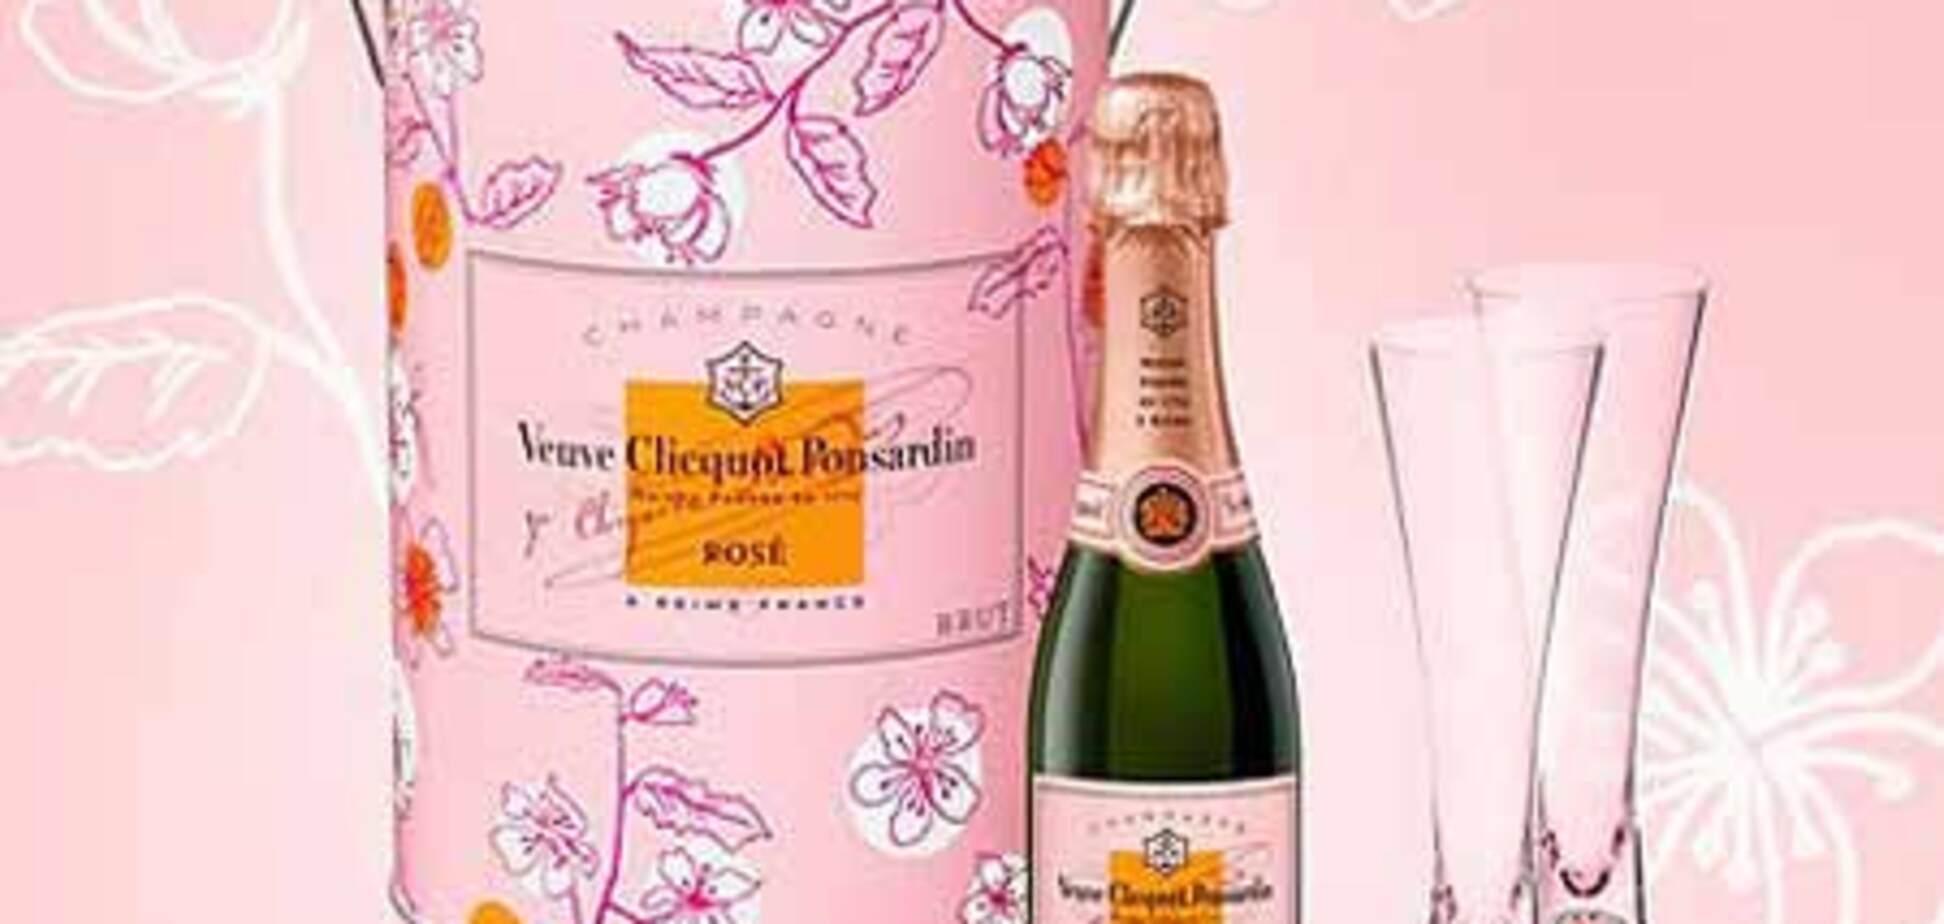 Восток по-французски: Sakura Veuve Clicquot на День св. Валентина